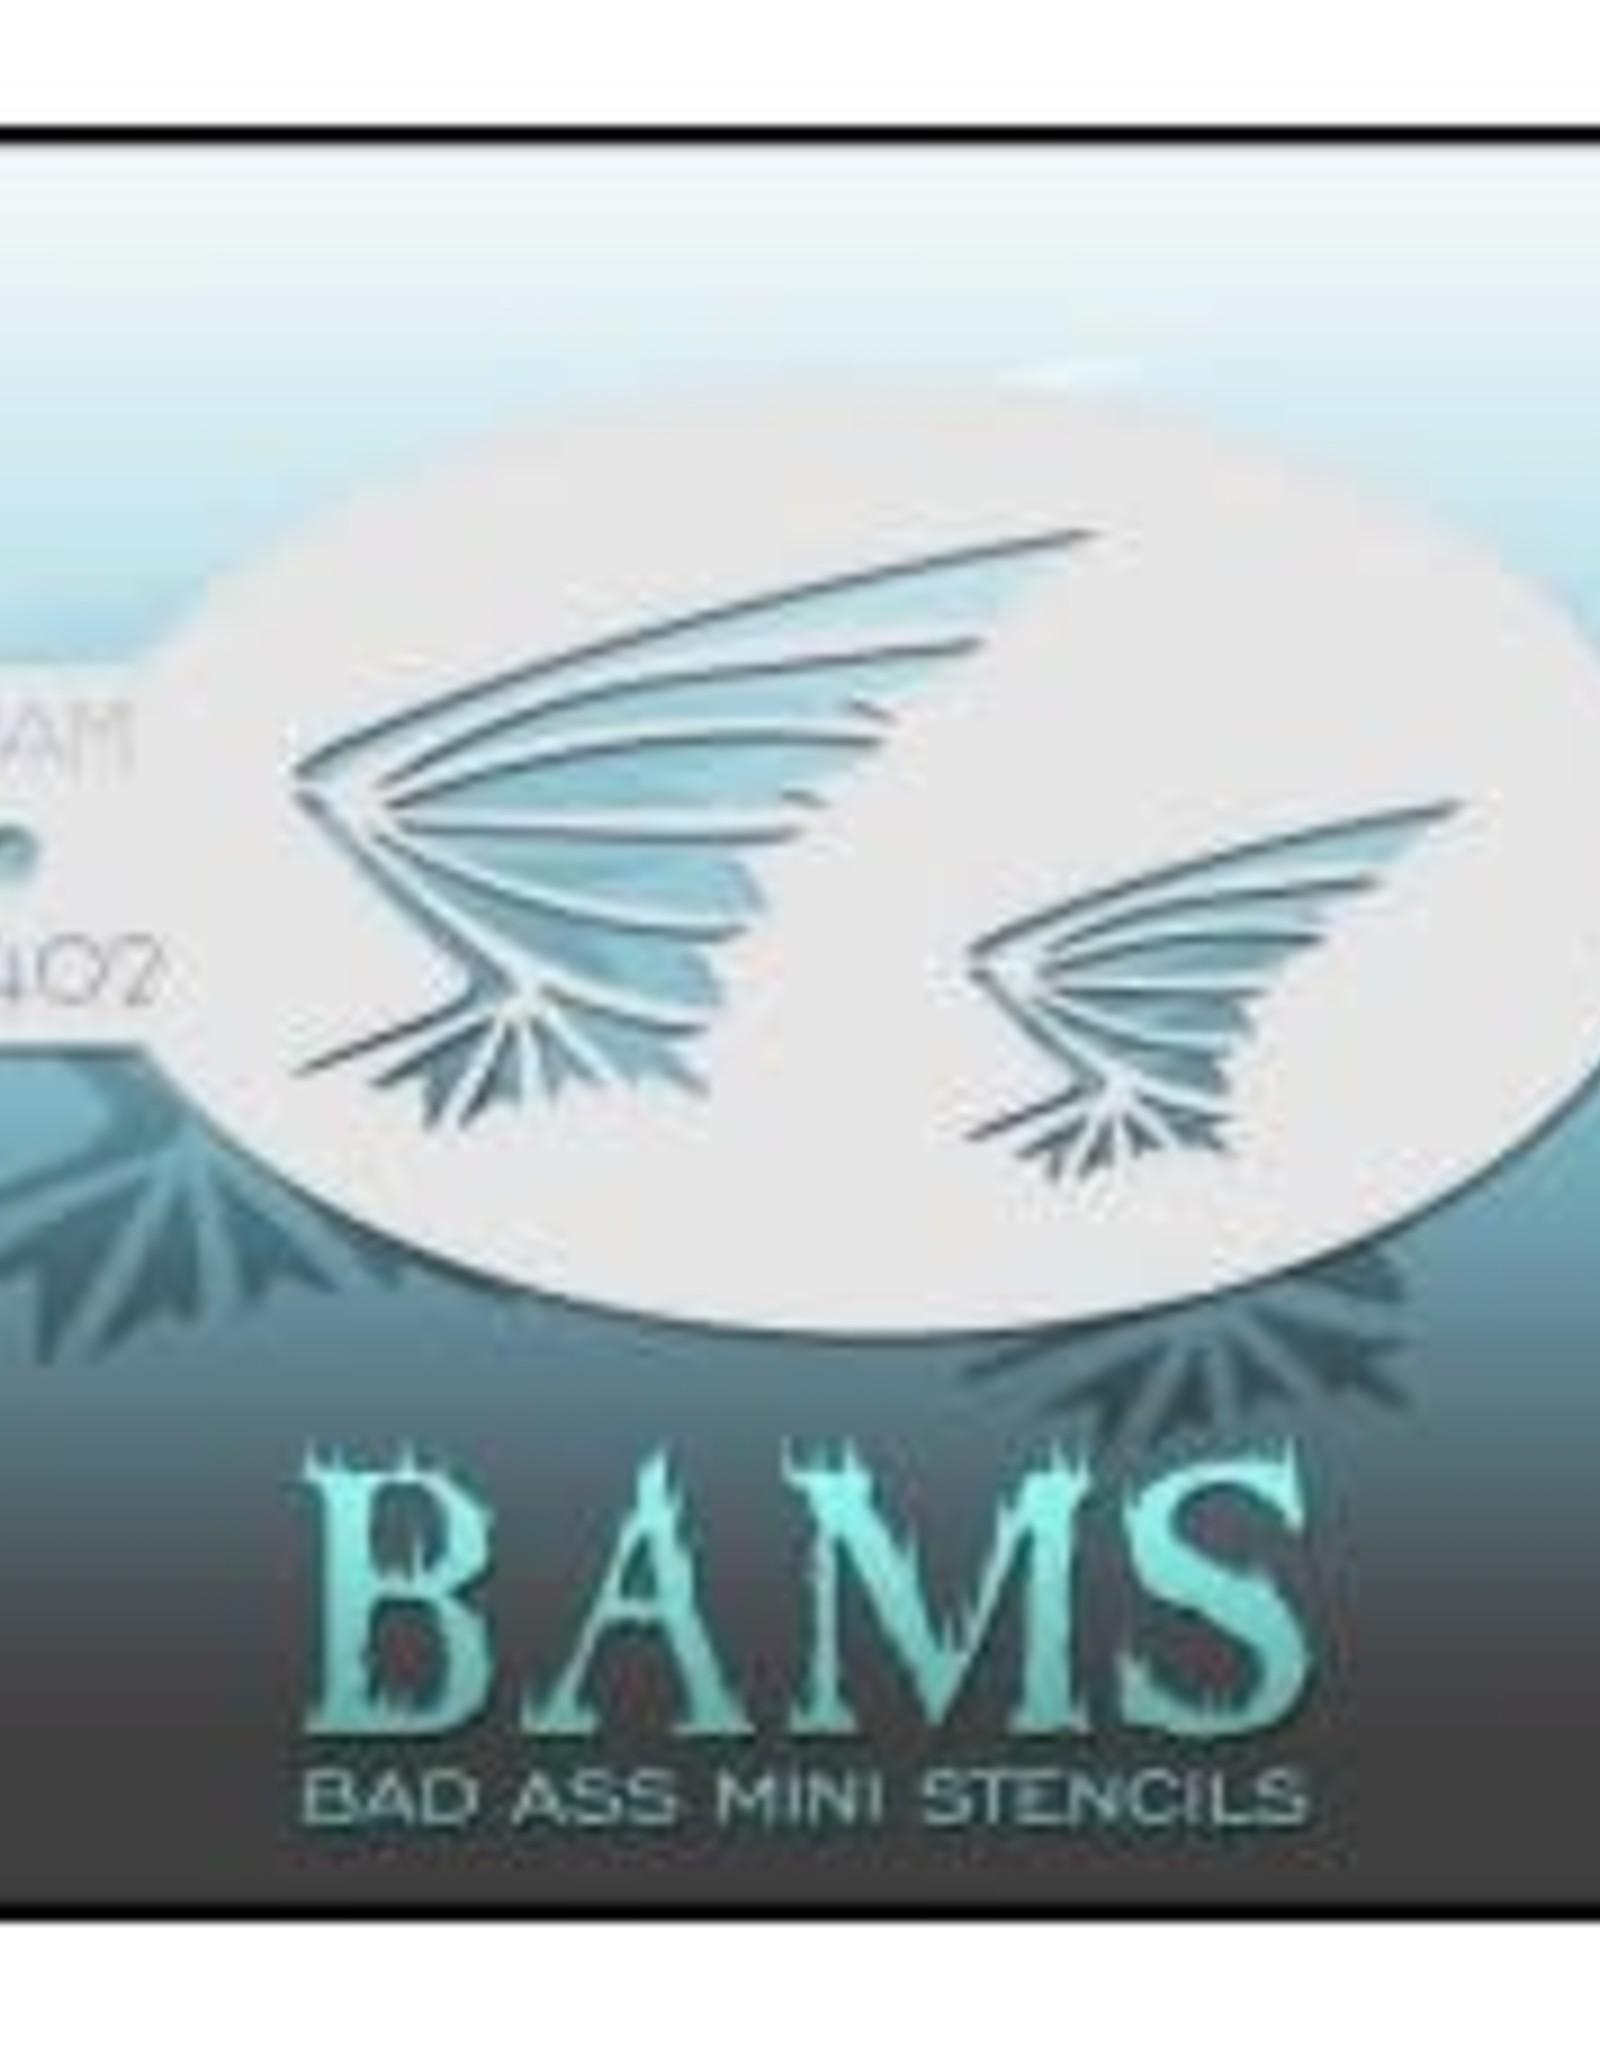 Bad Ass Stencils Bad Ass Mini Stencil - BAM1402